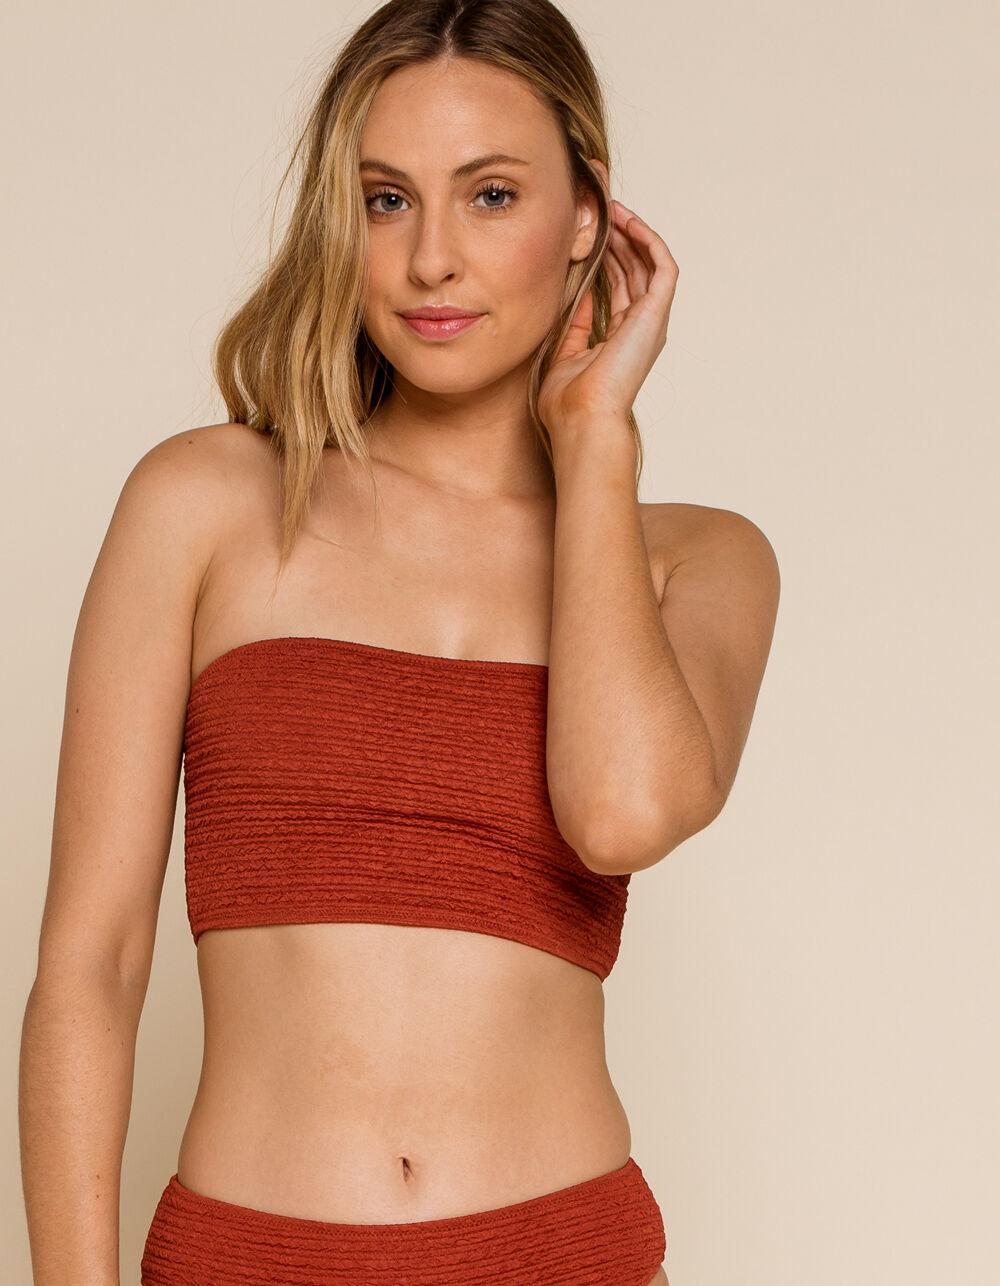 WEST OF MELROSE Heat Wave Long Bandeau Bikini Top